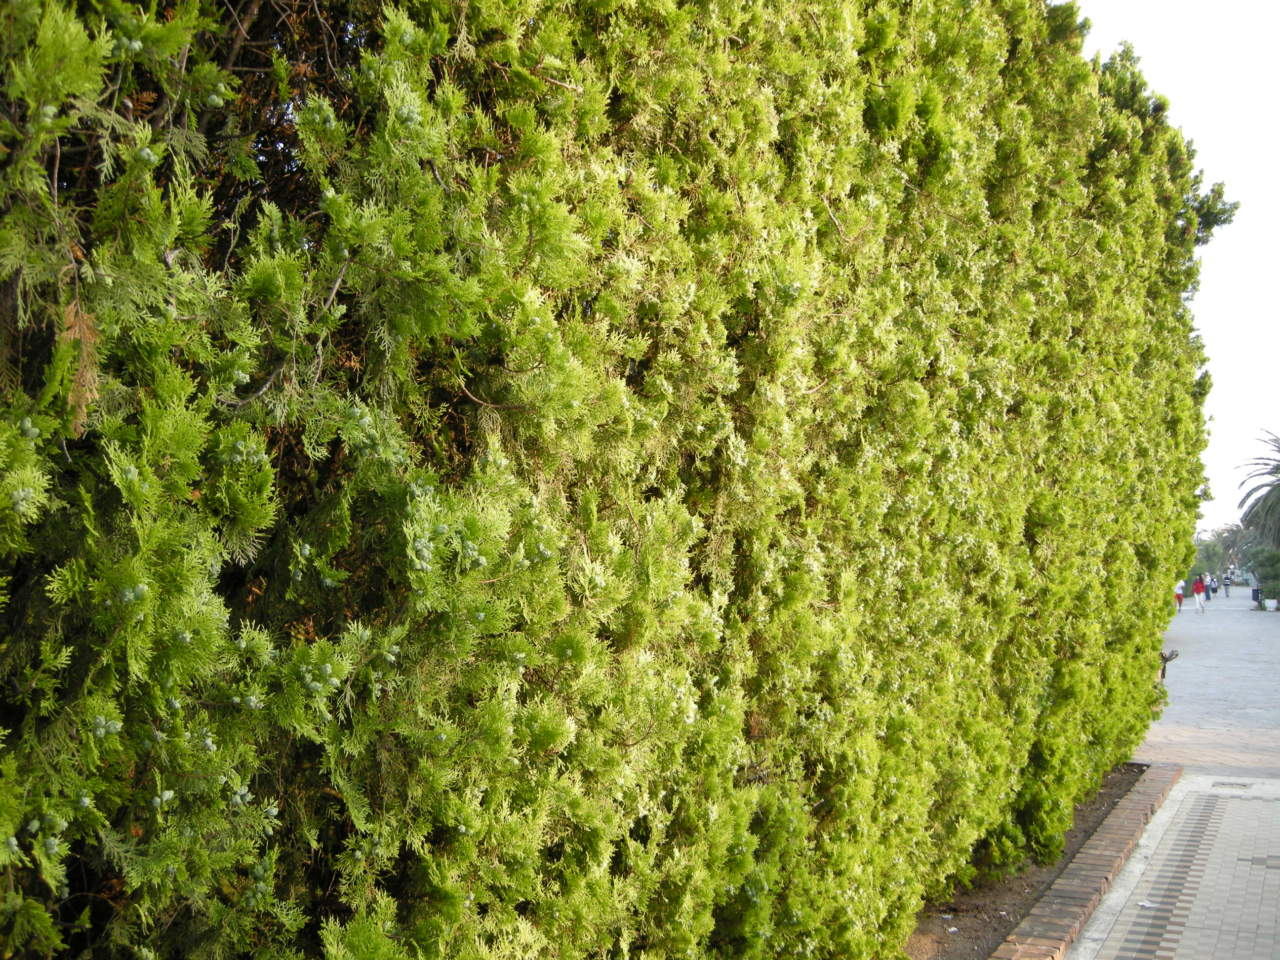 Piante Da Siepi Immagini tuia: per una siepe facile - passione in verde